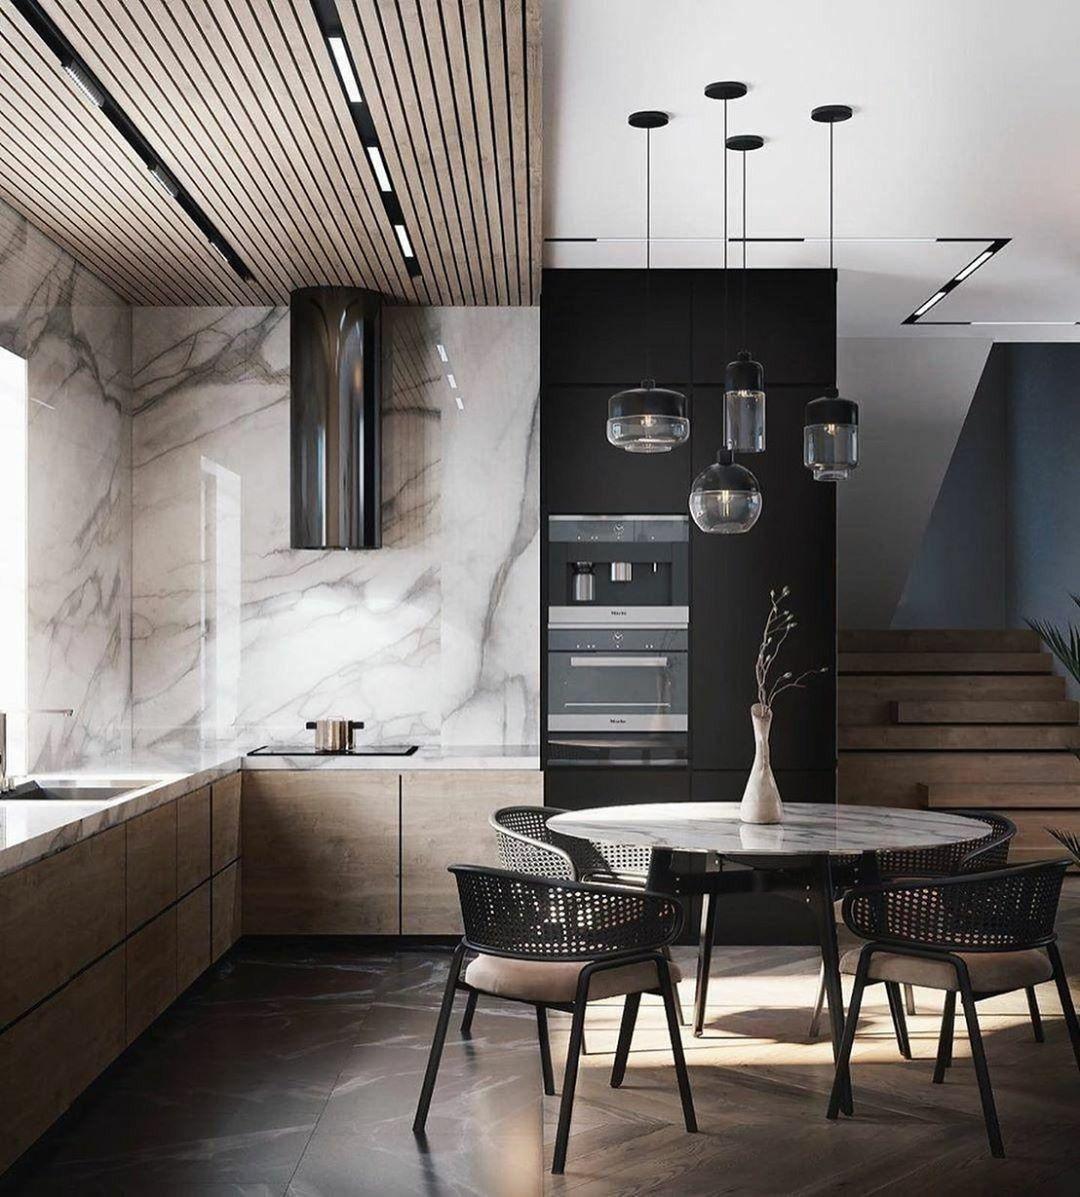 Apartment Inspiration Bureau L Interio In 2020 Kitchen Design Trends Copper Interior Luxury Interior